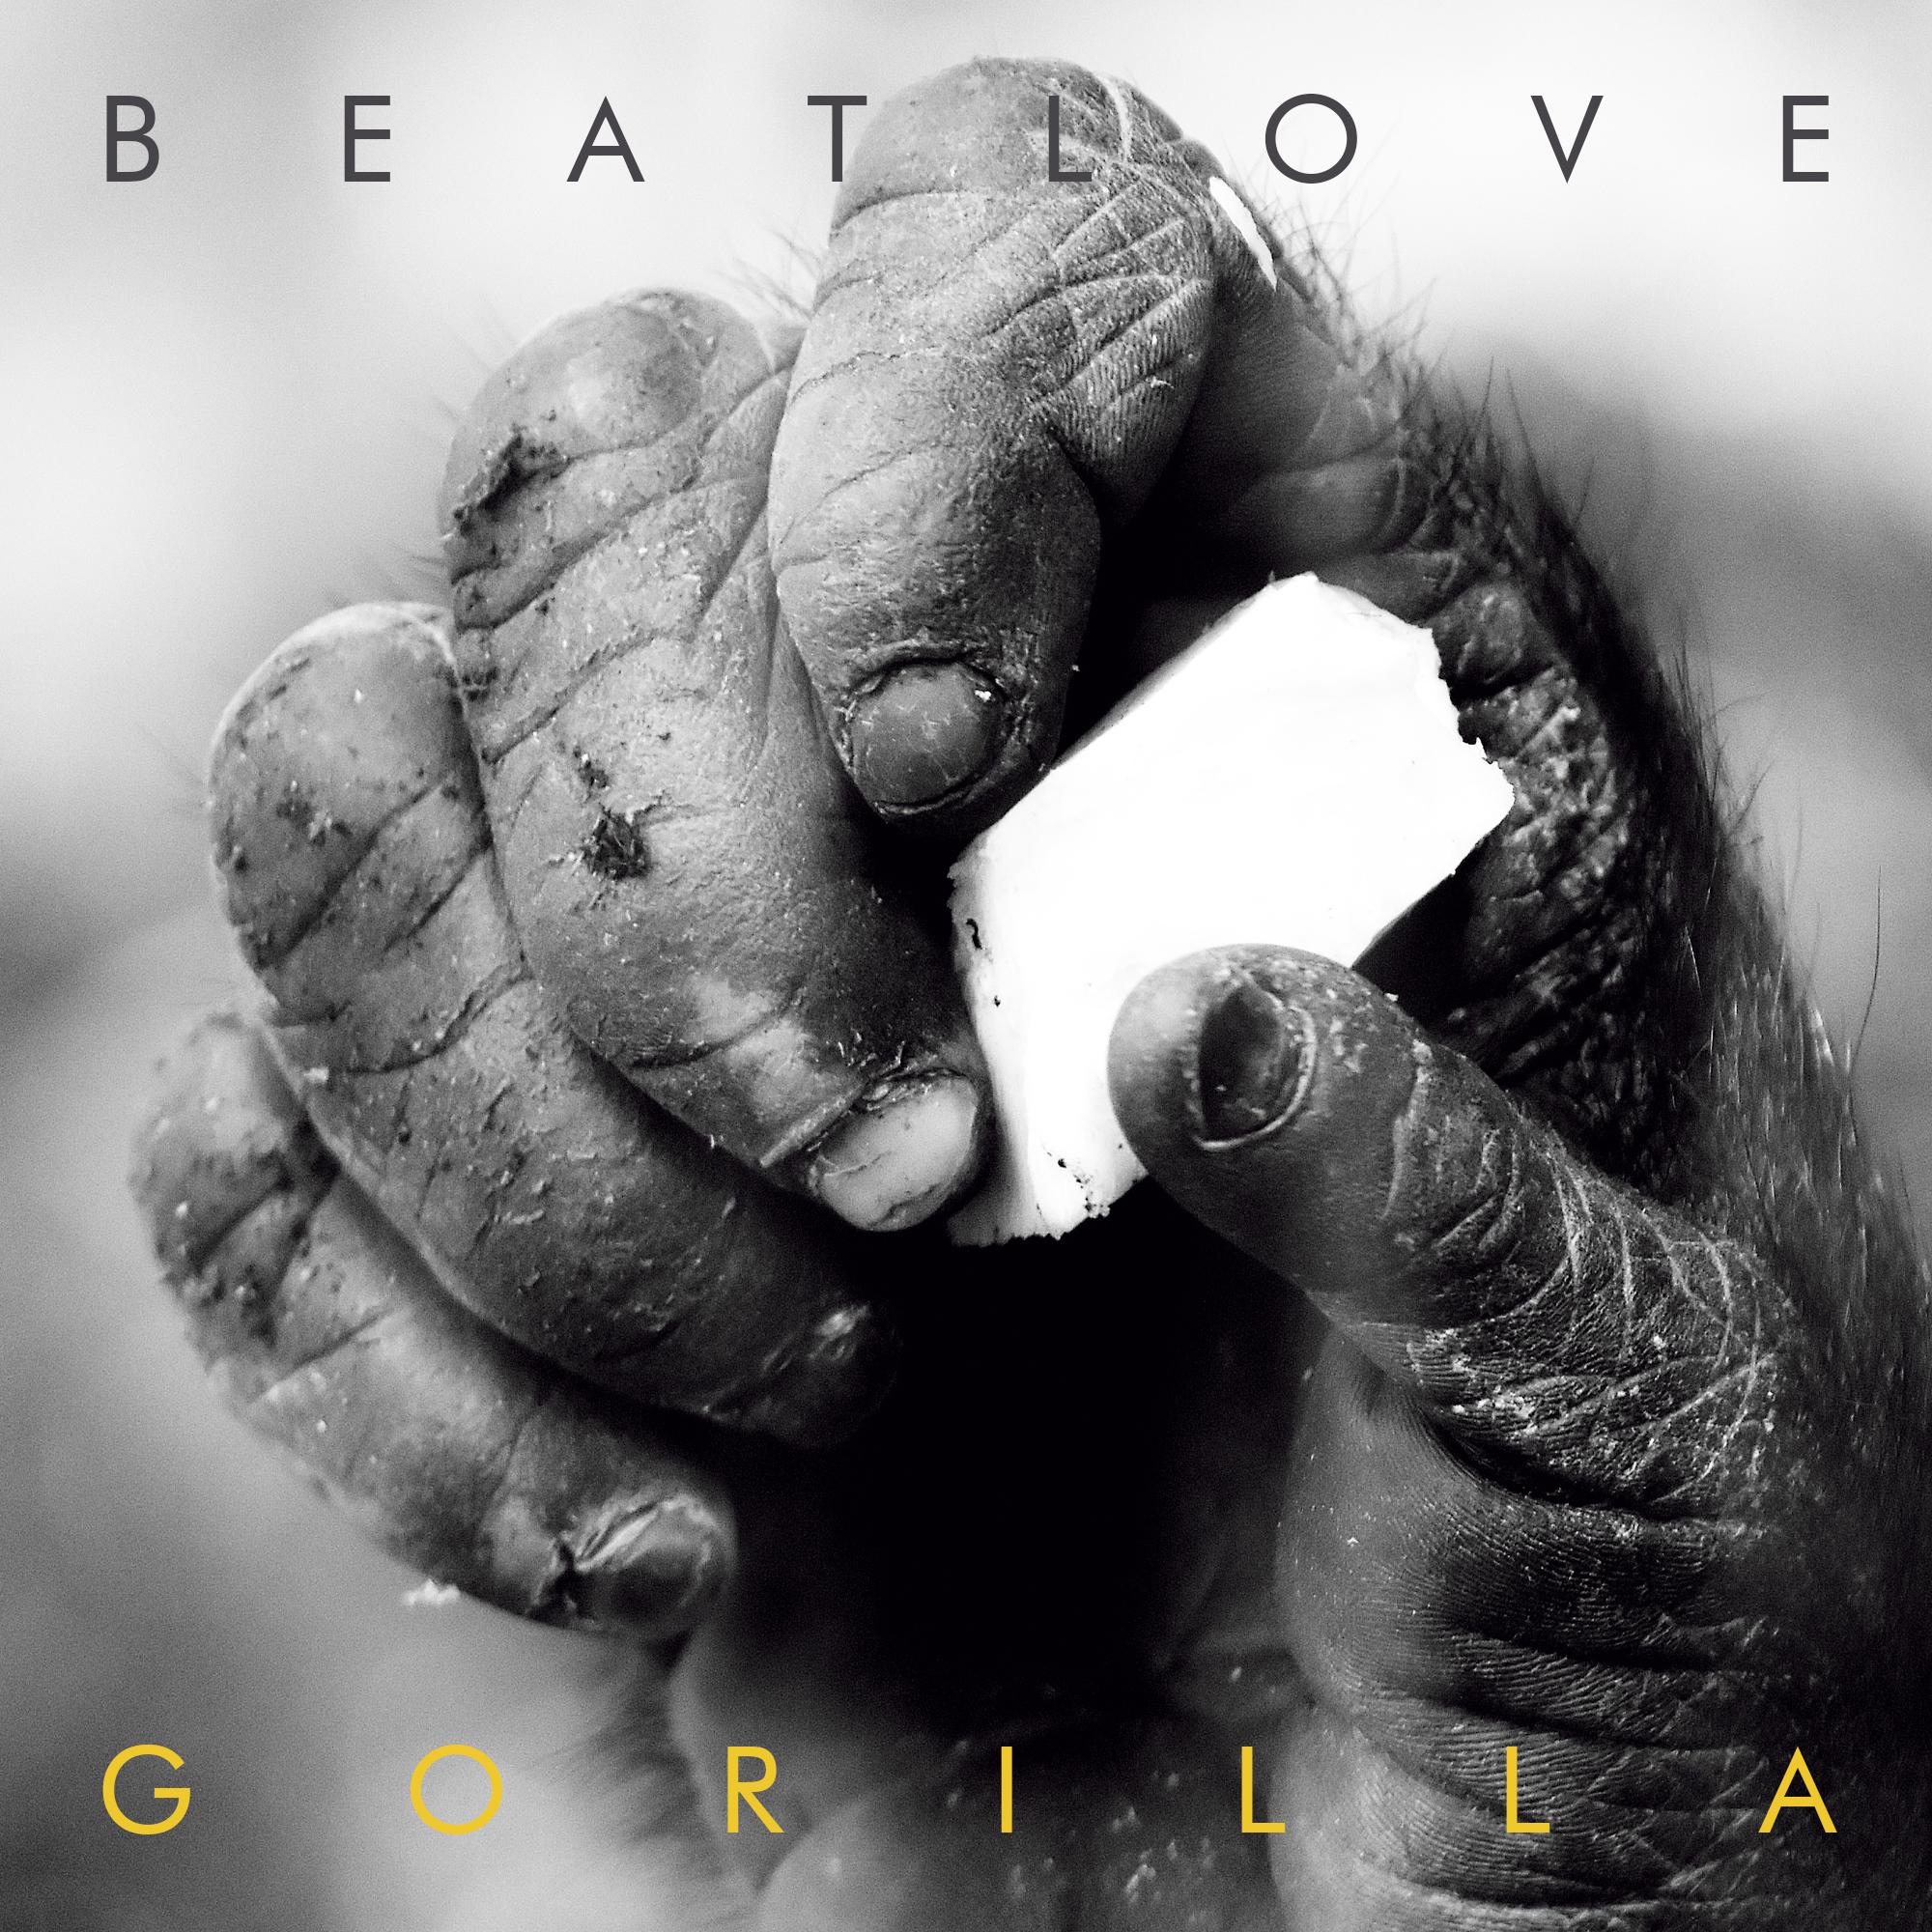 BeatLove - Train